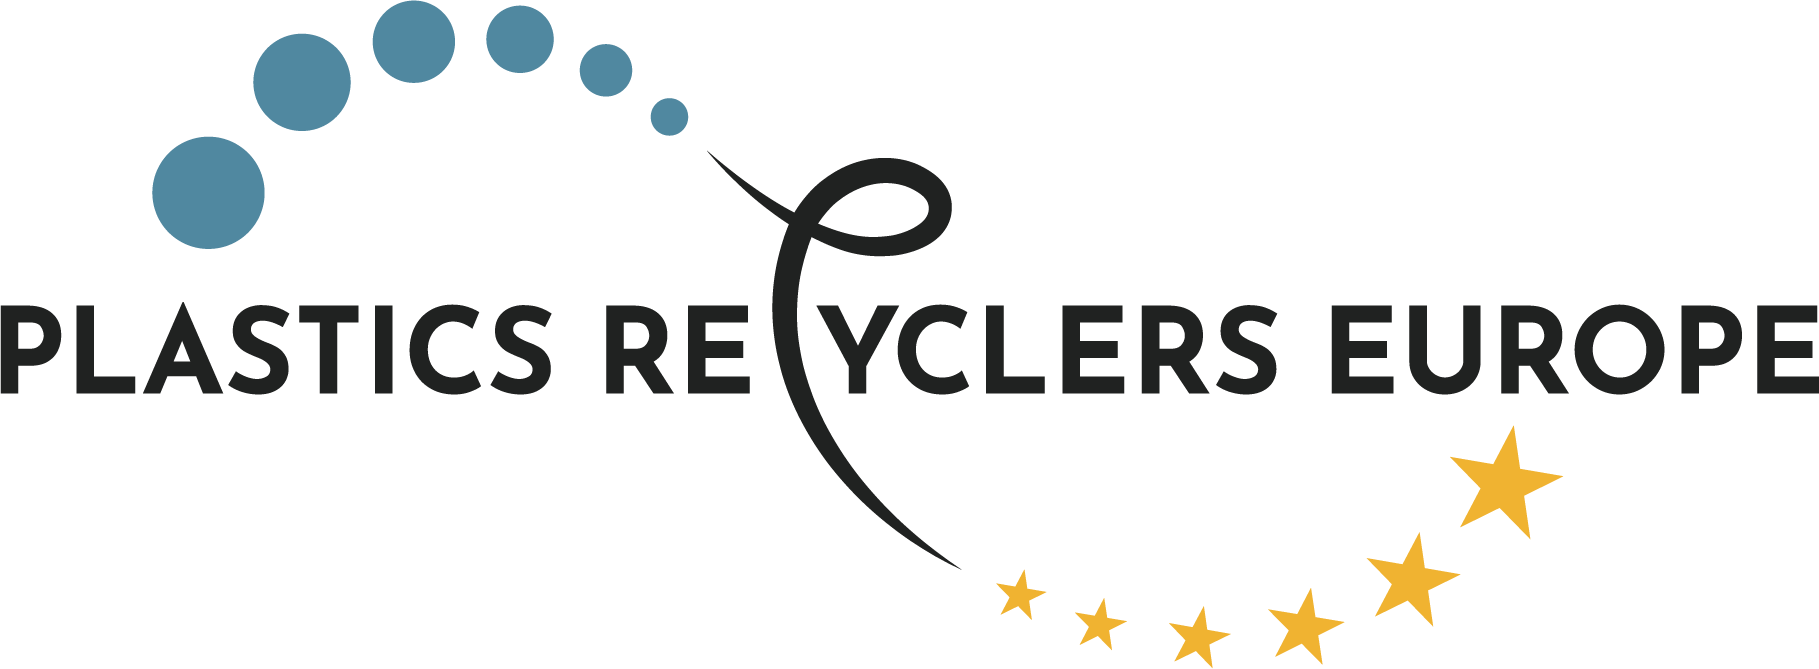 https://europeanplasticspact.org/wp-content/uploads/2020/03/Plastics-Recyclers-Europe.png